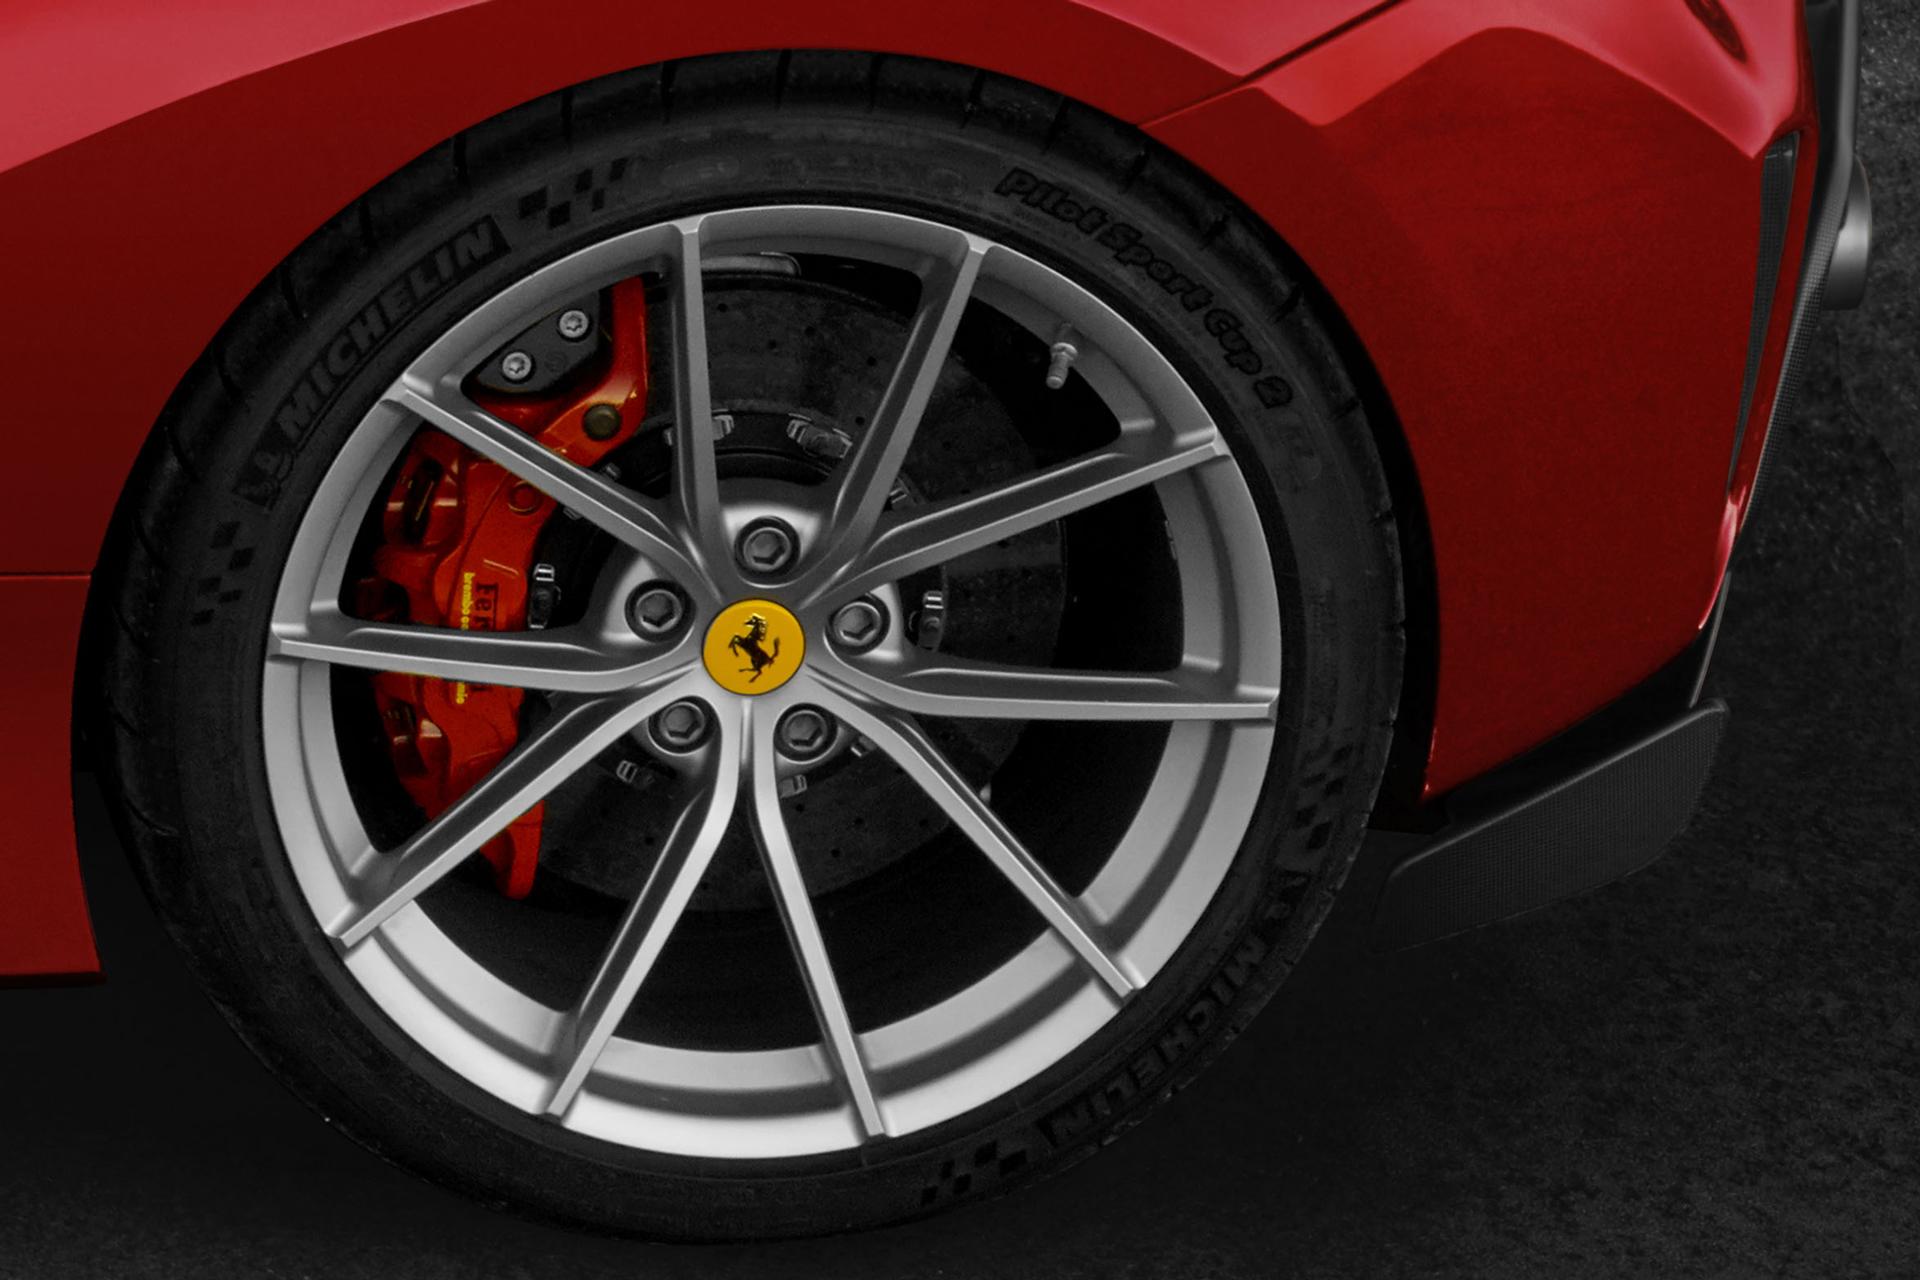 Ferrari 488 Pista - 2018 - front wheel / jante avant